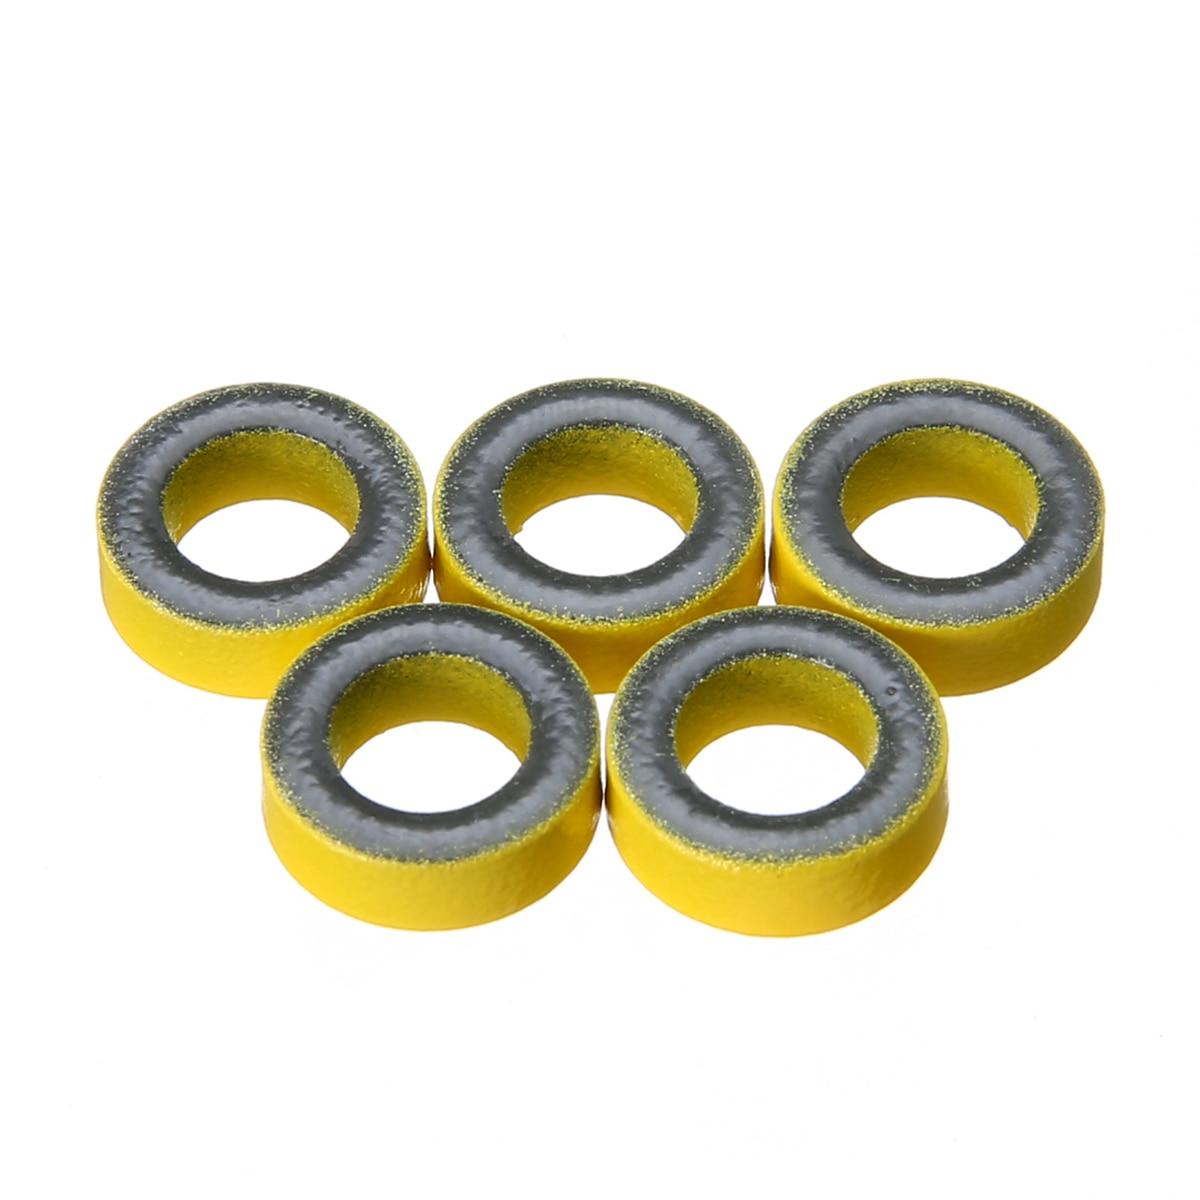 5pcs/lot Yellow Micrometals T50-6 Carbonyl Iron Powder Toroidal Core RF Toroid HF High Frequency HAM QRP Iron Cores Mayitr